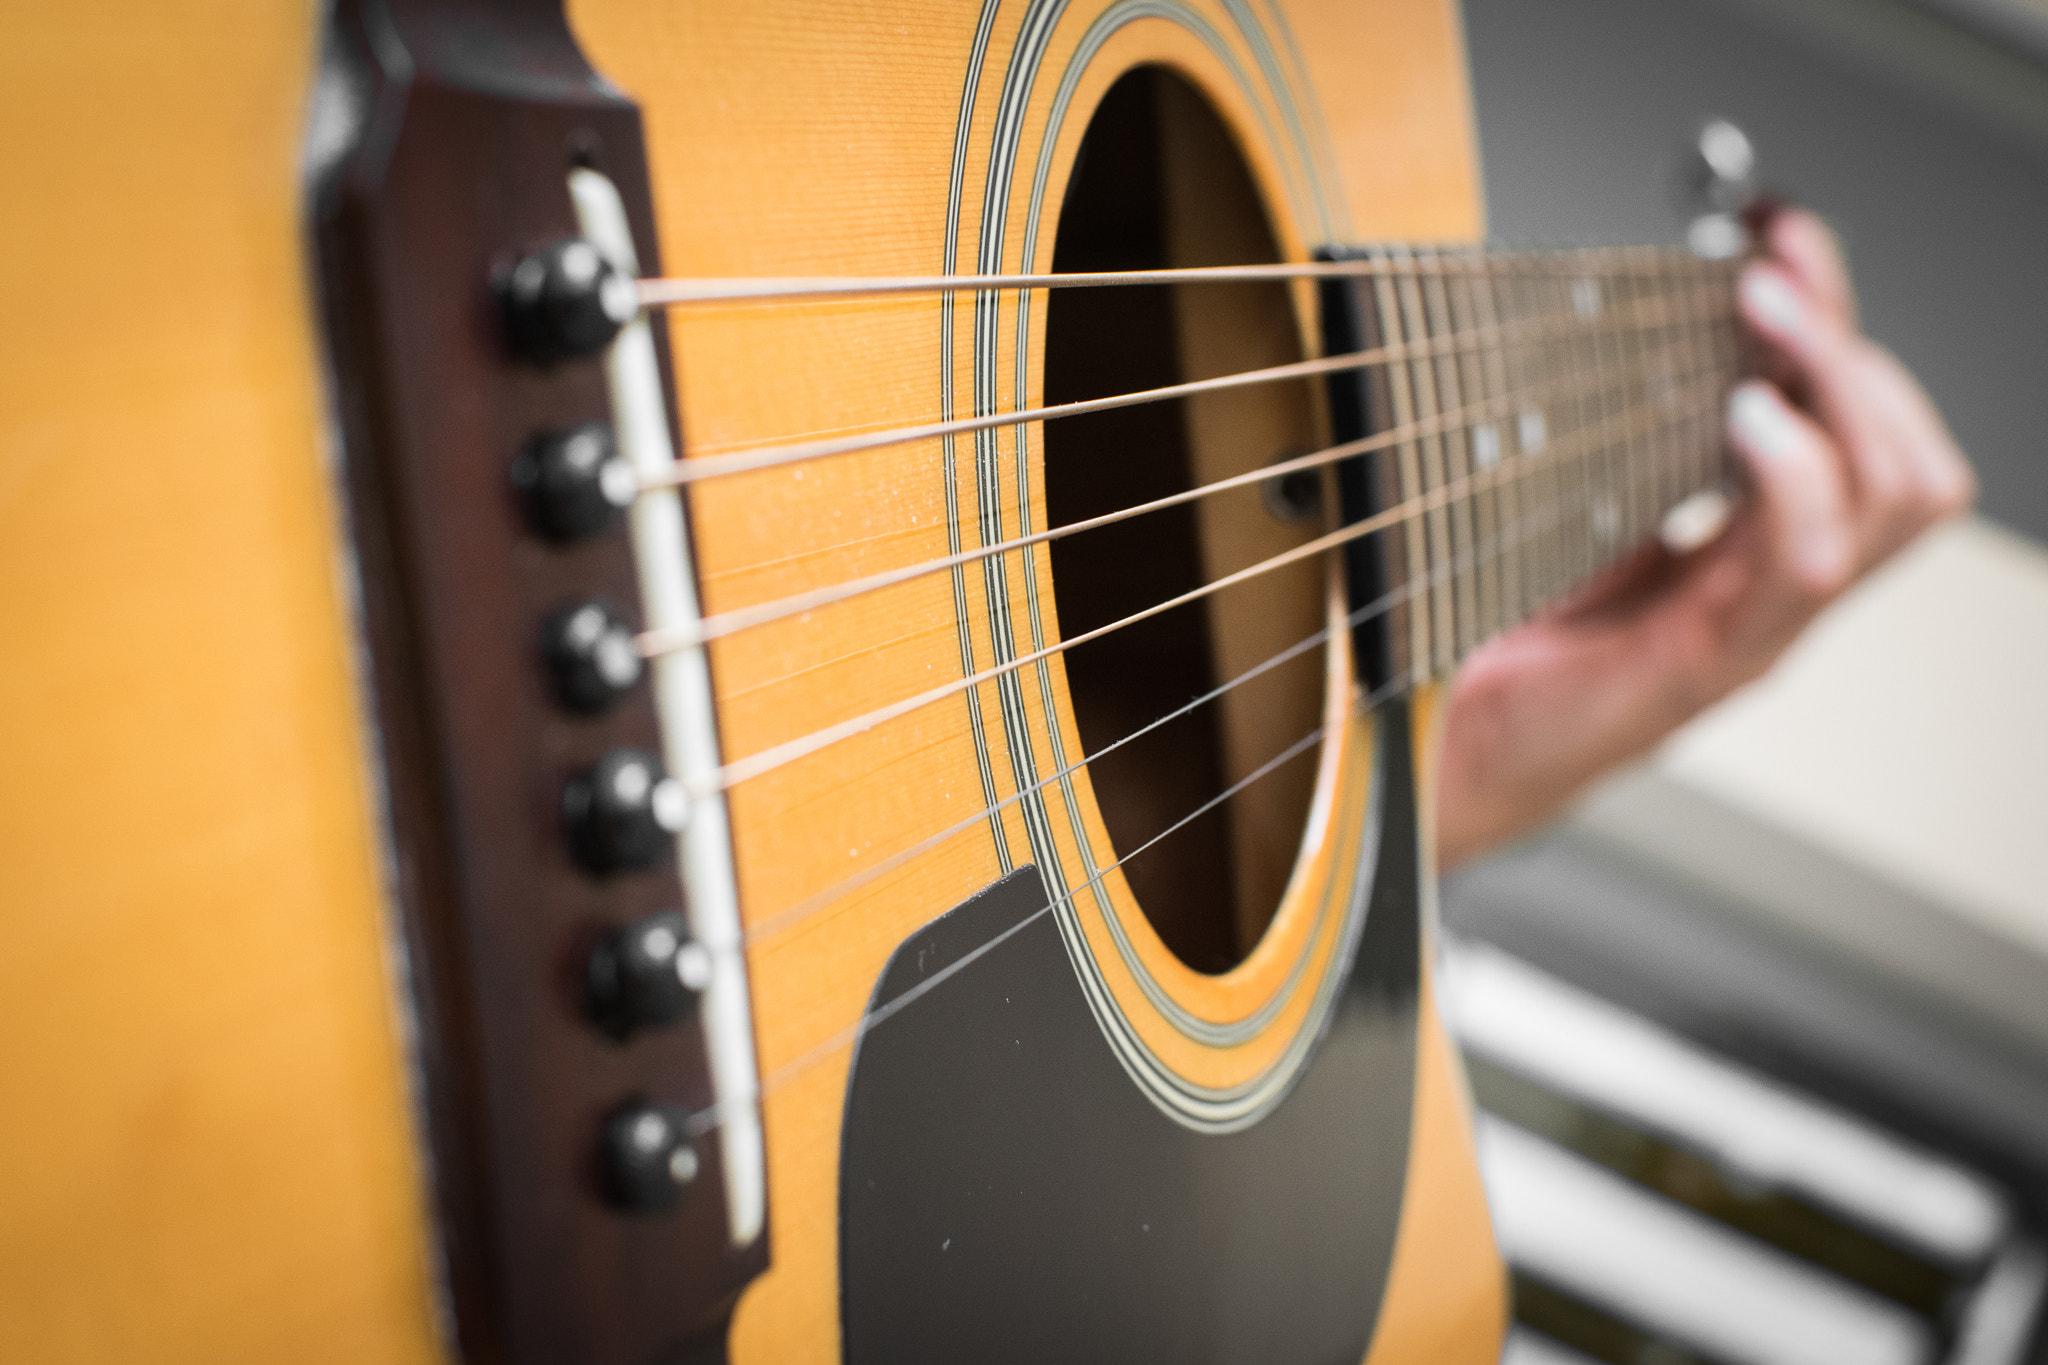 File:Acoustic Guitar Solo (240361337).jpeg - Wikimedia Commons